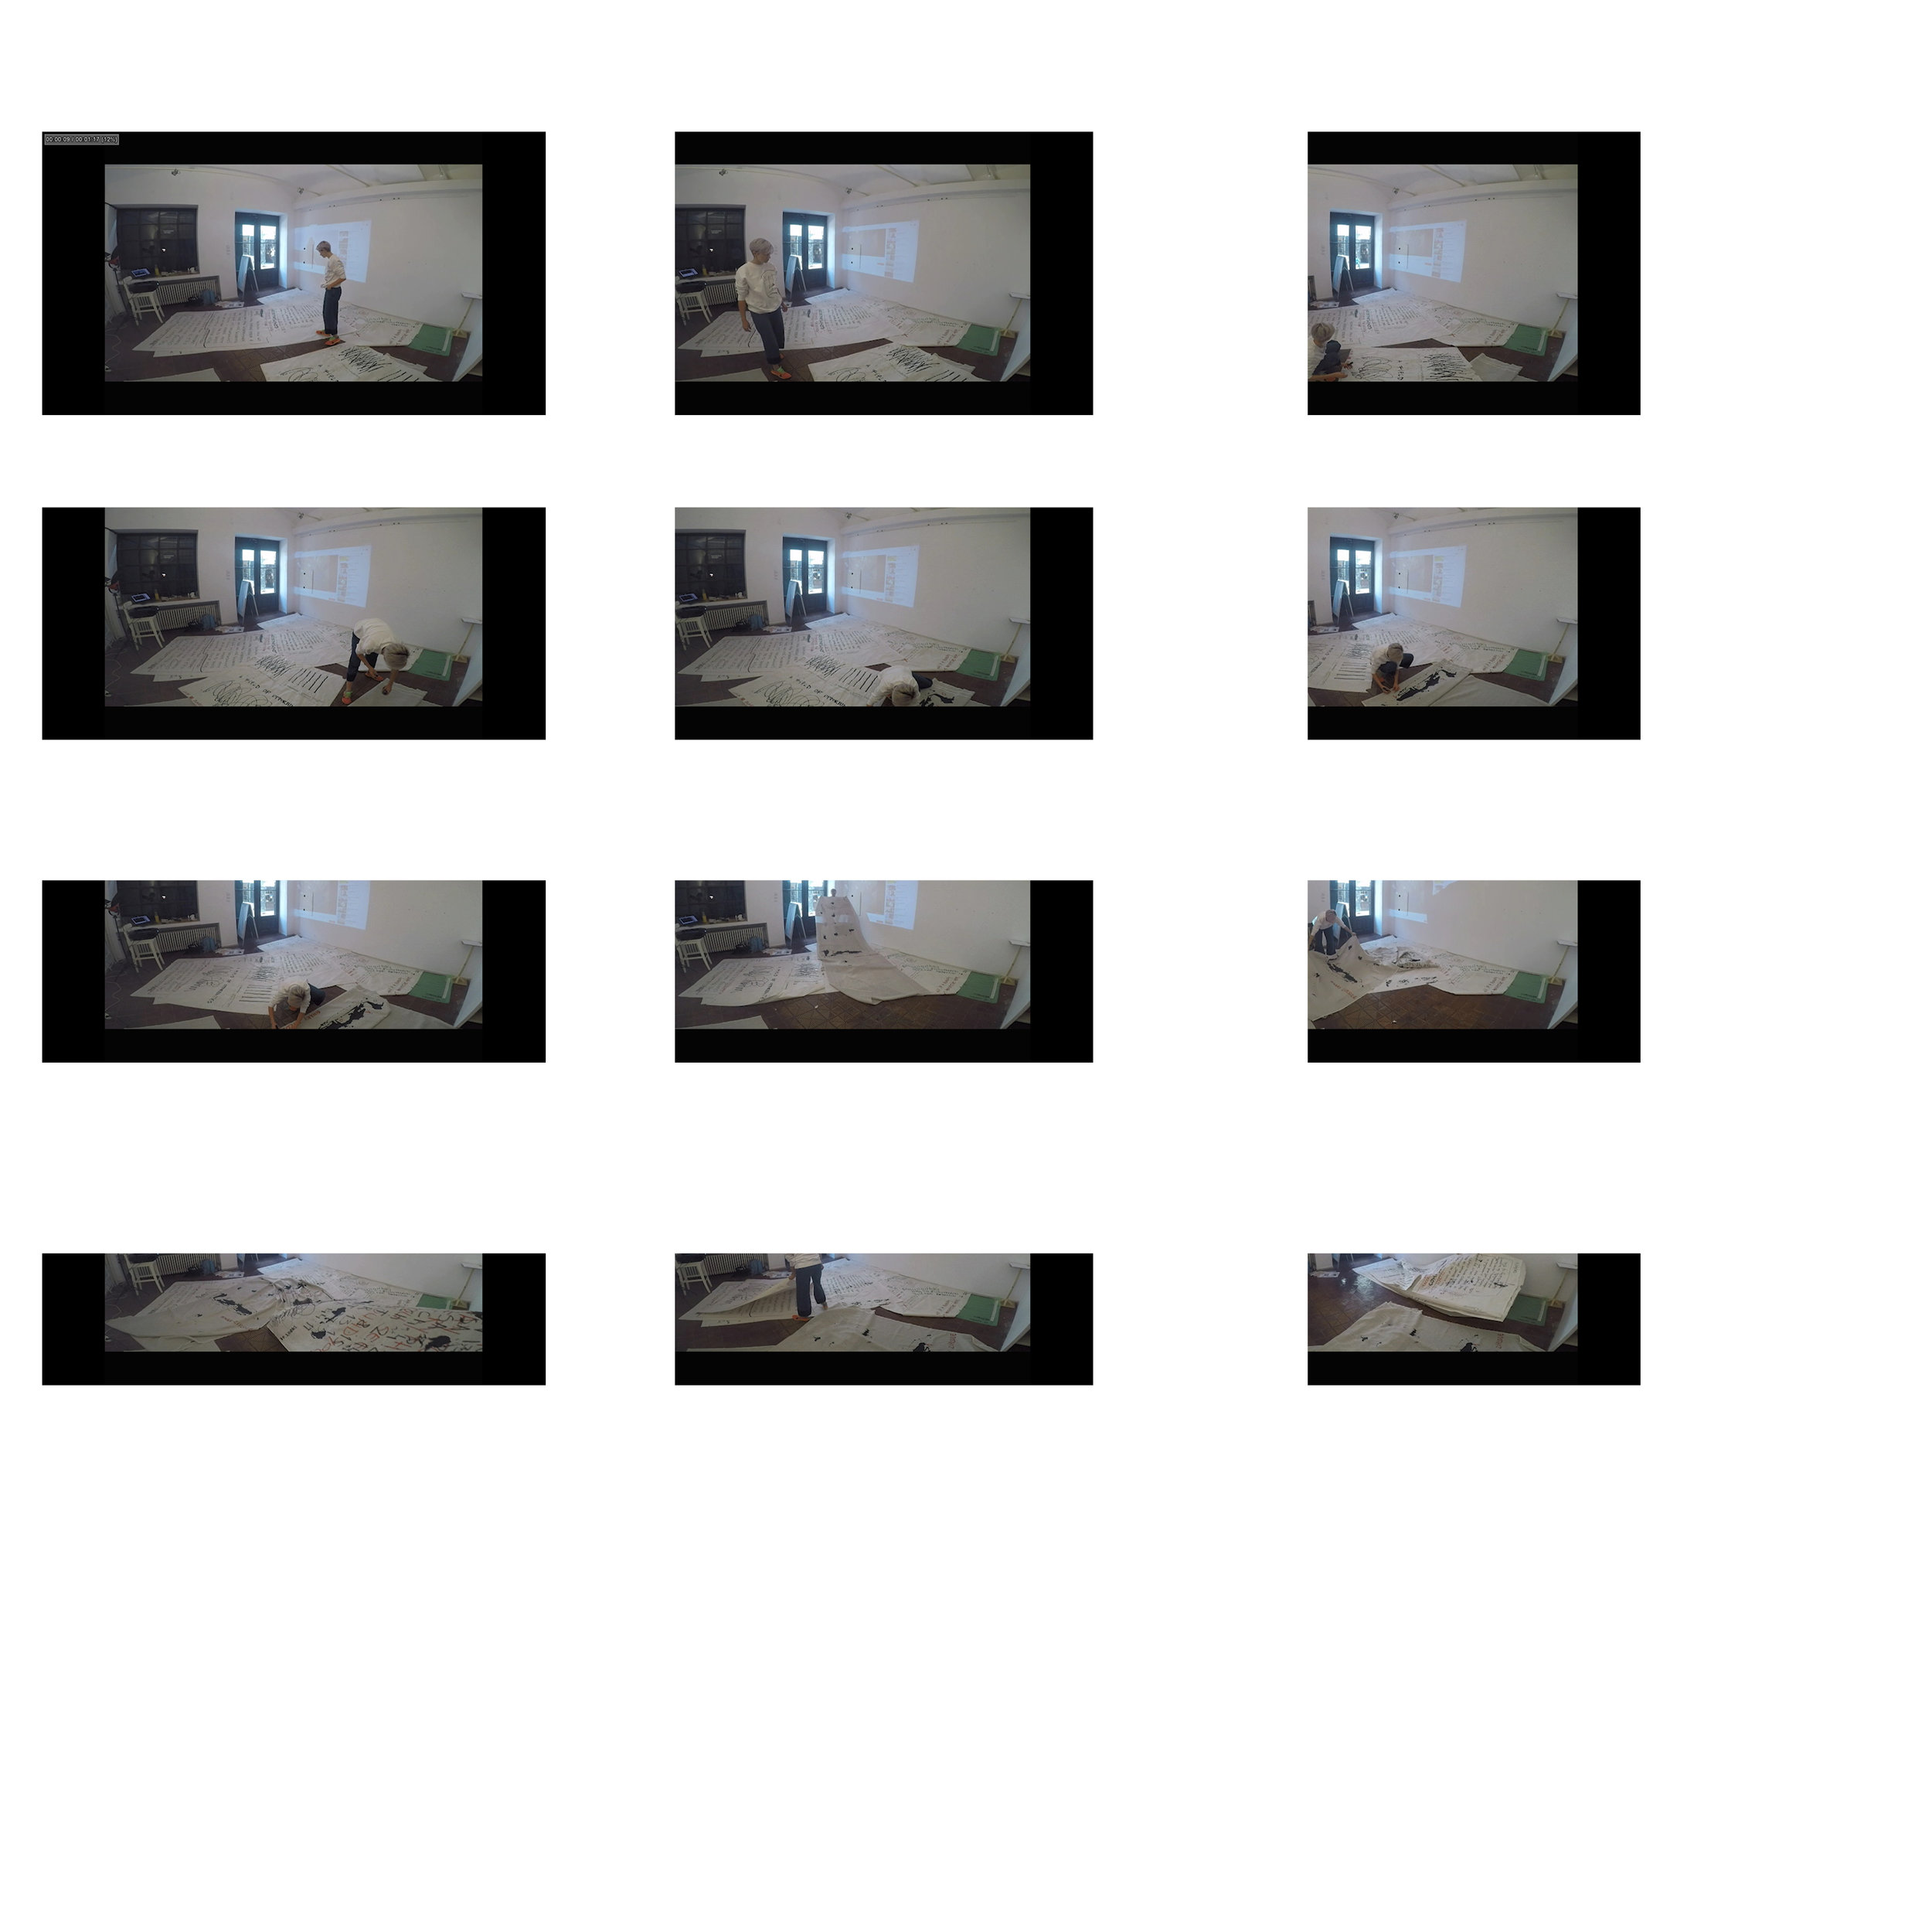 artist@work / 15 Design Gallery 12-17 October / 10 meters of research